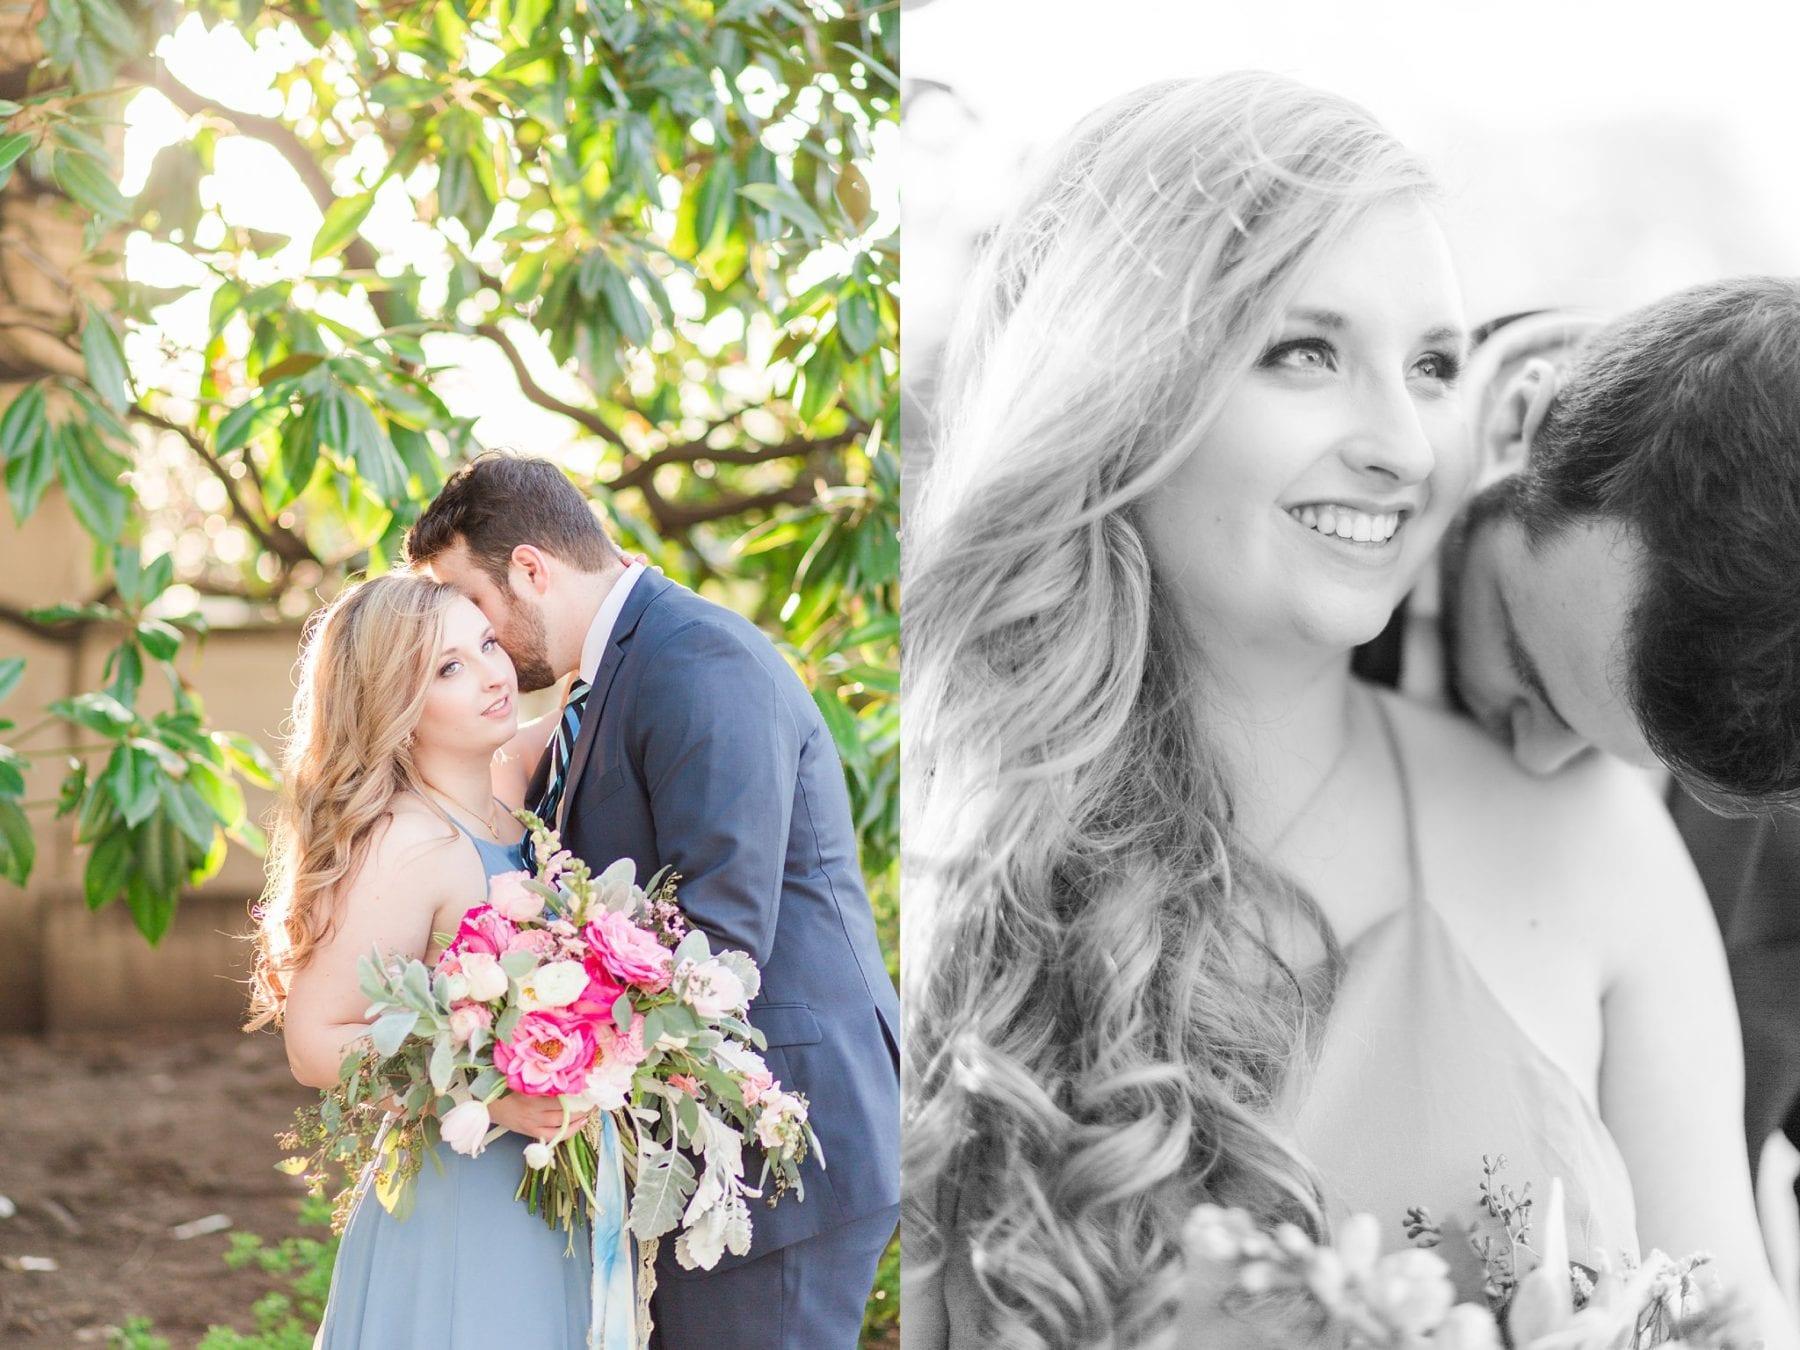 Capitol Hill Engagement Photos Kelly & Zach Washington DC Wedding Photographer Megan Kelsey Photography-190.jpg